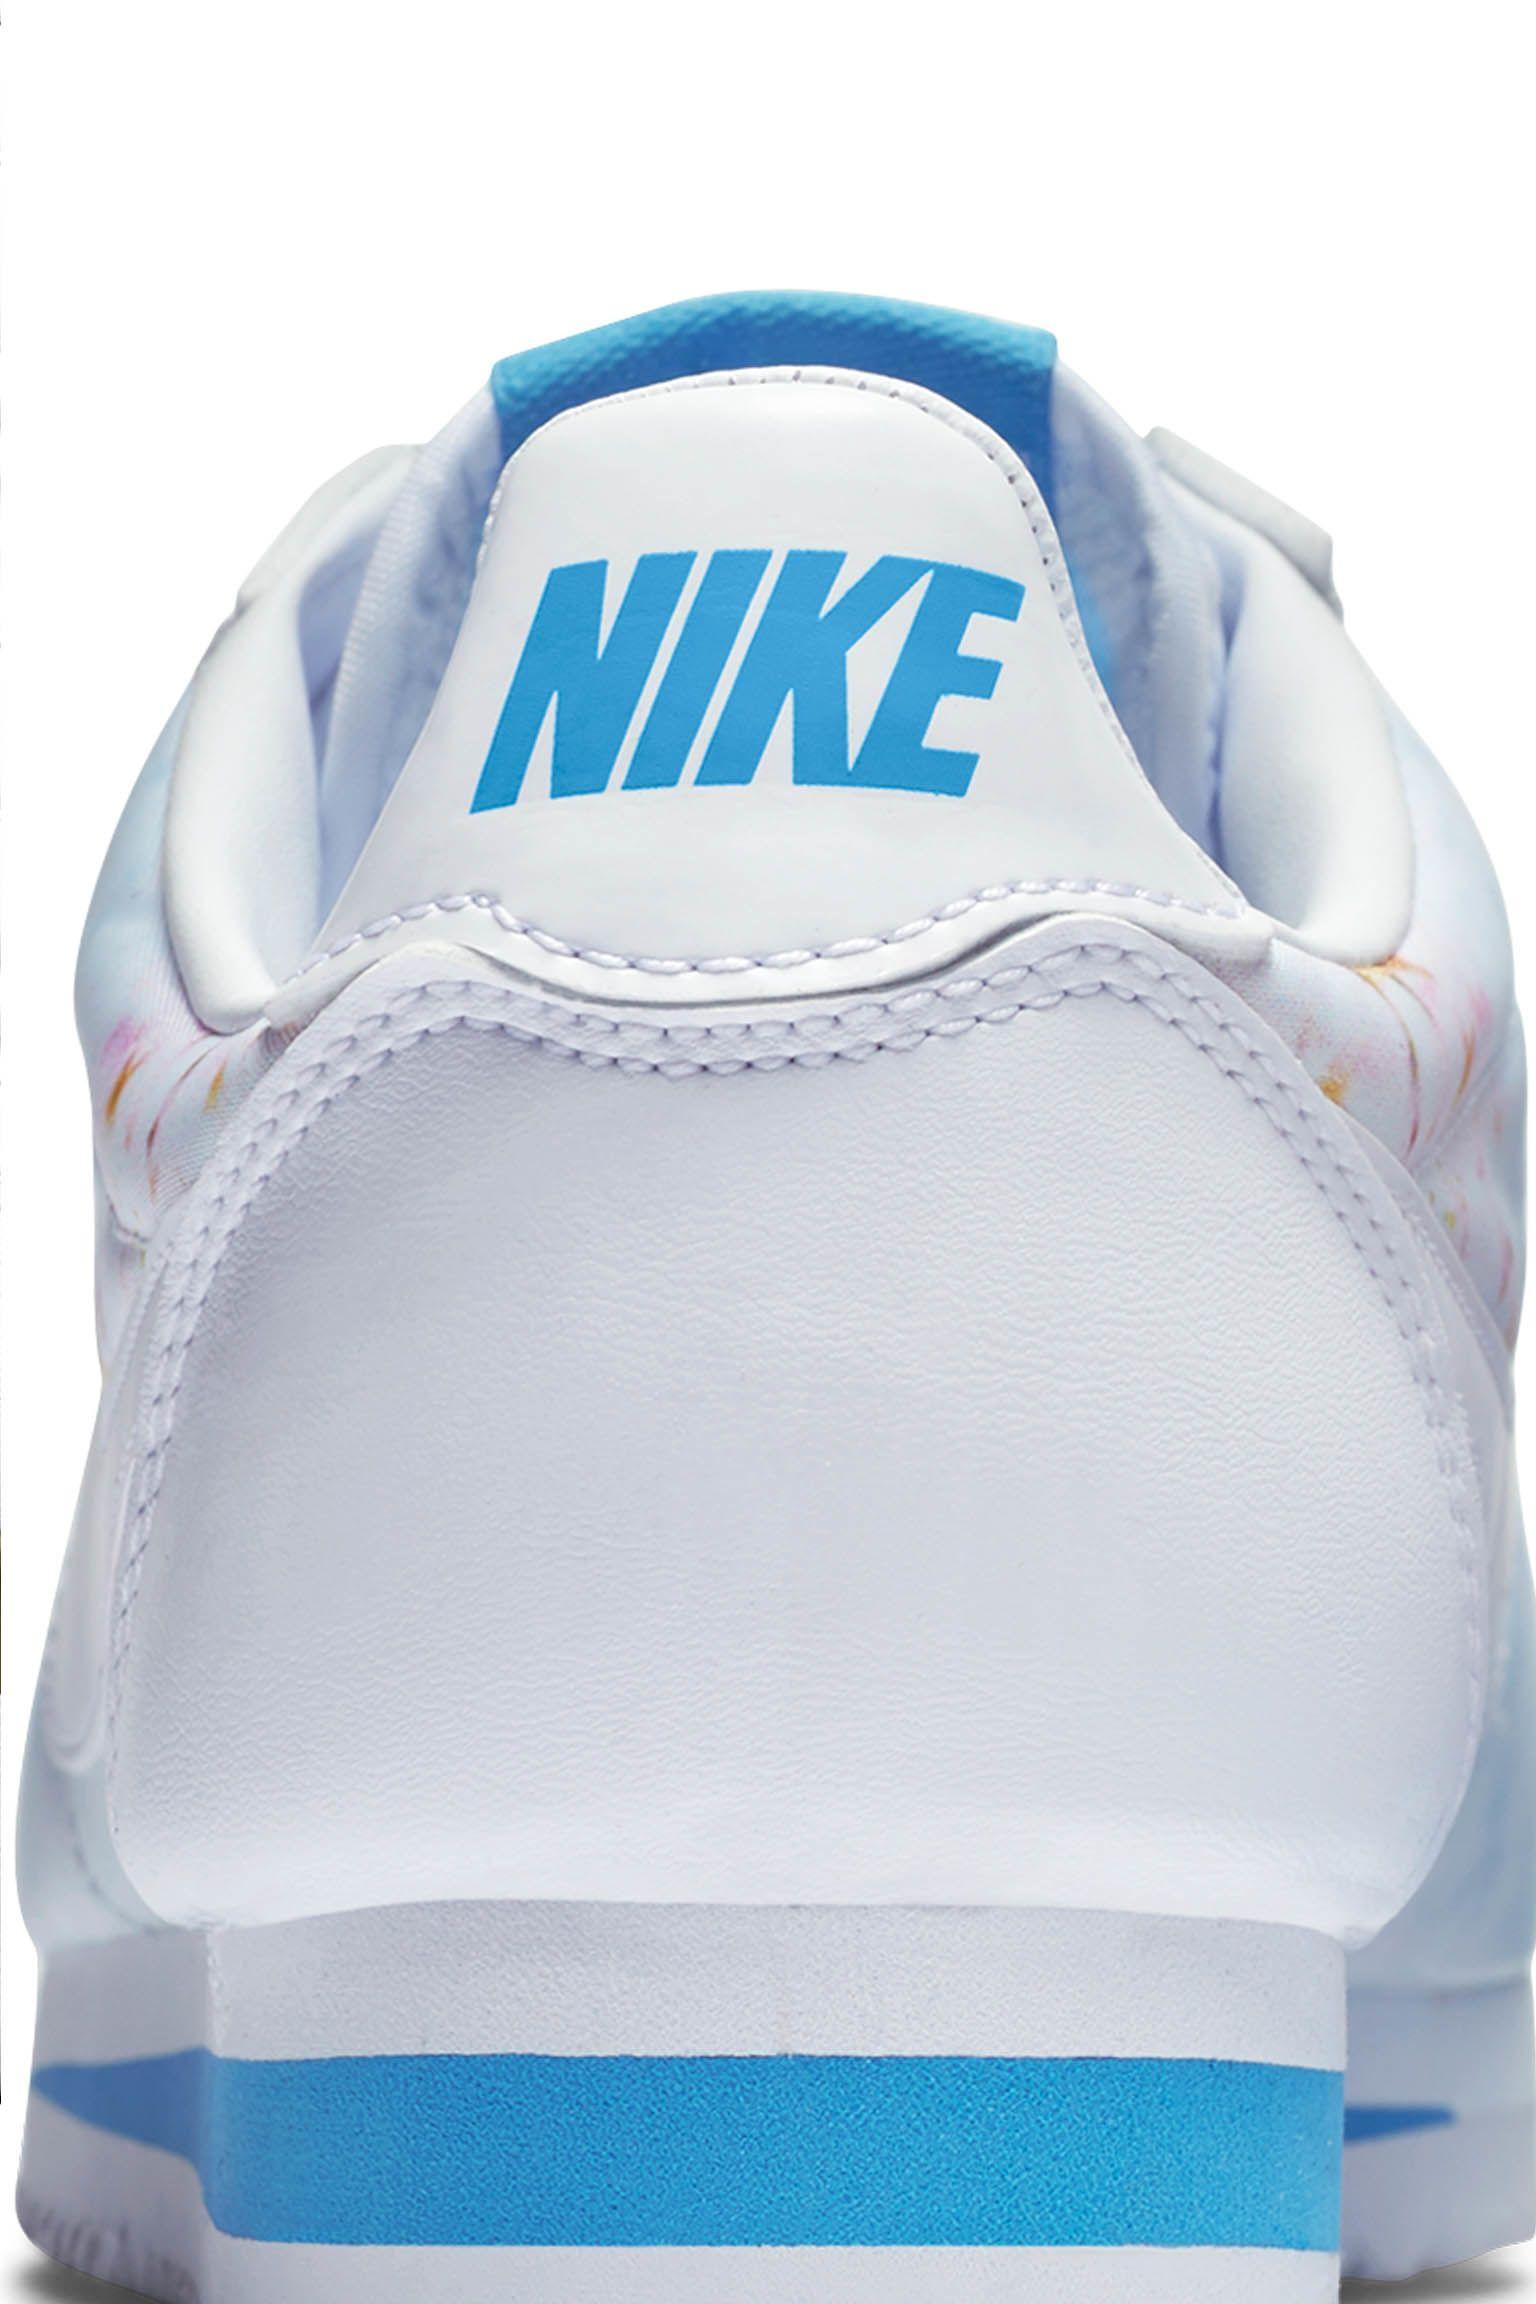 Women's Nike Classic Cortez 'Cherry Blossom'